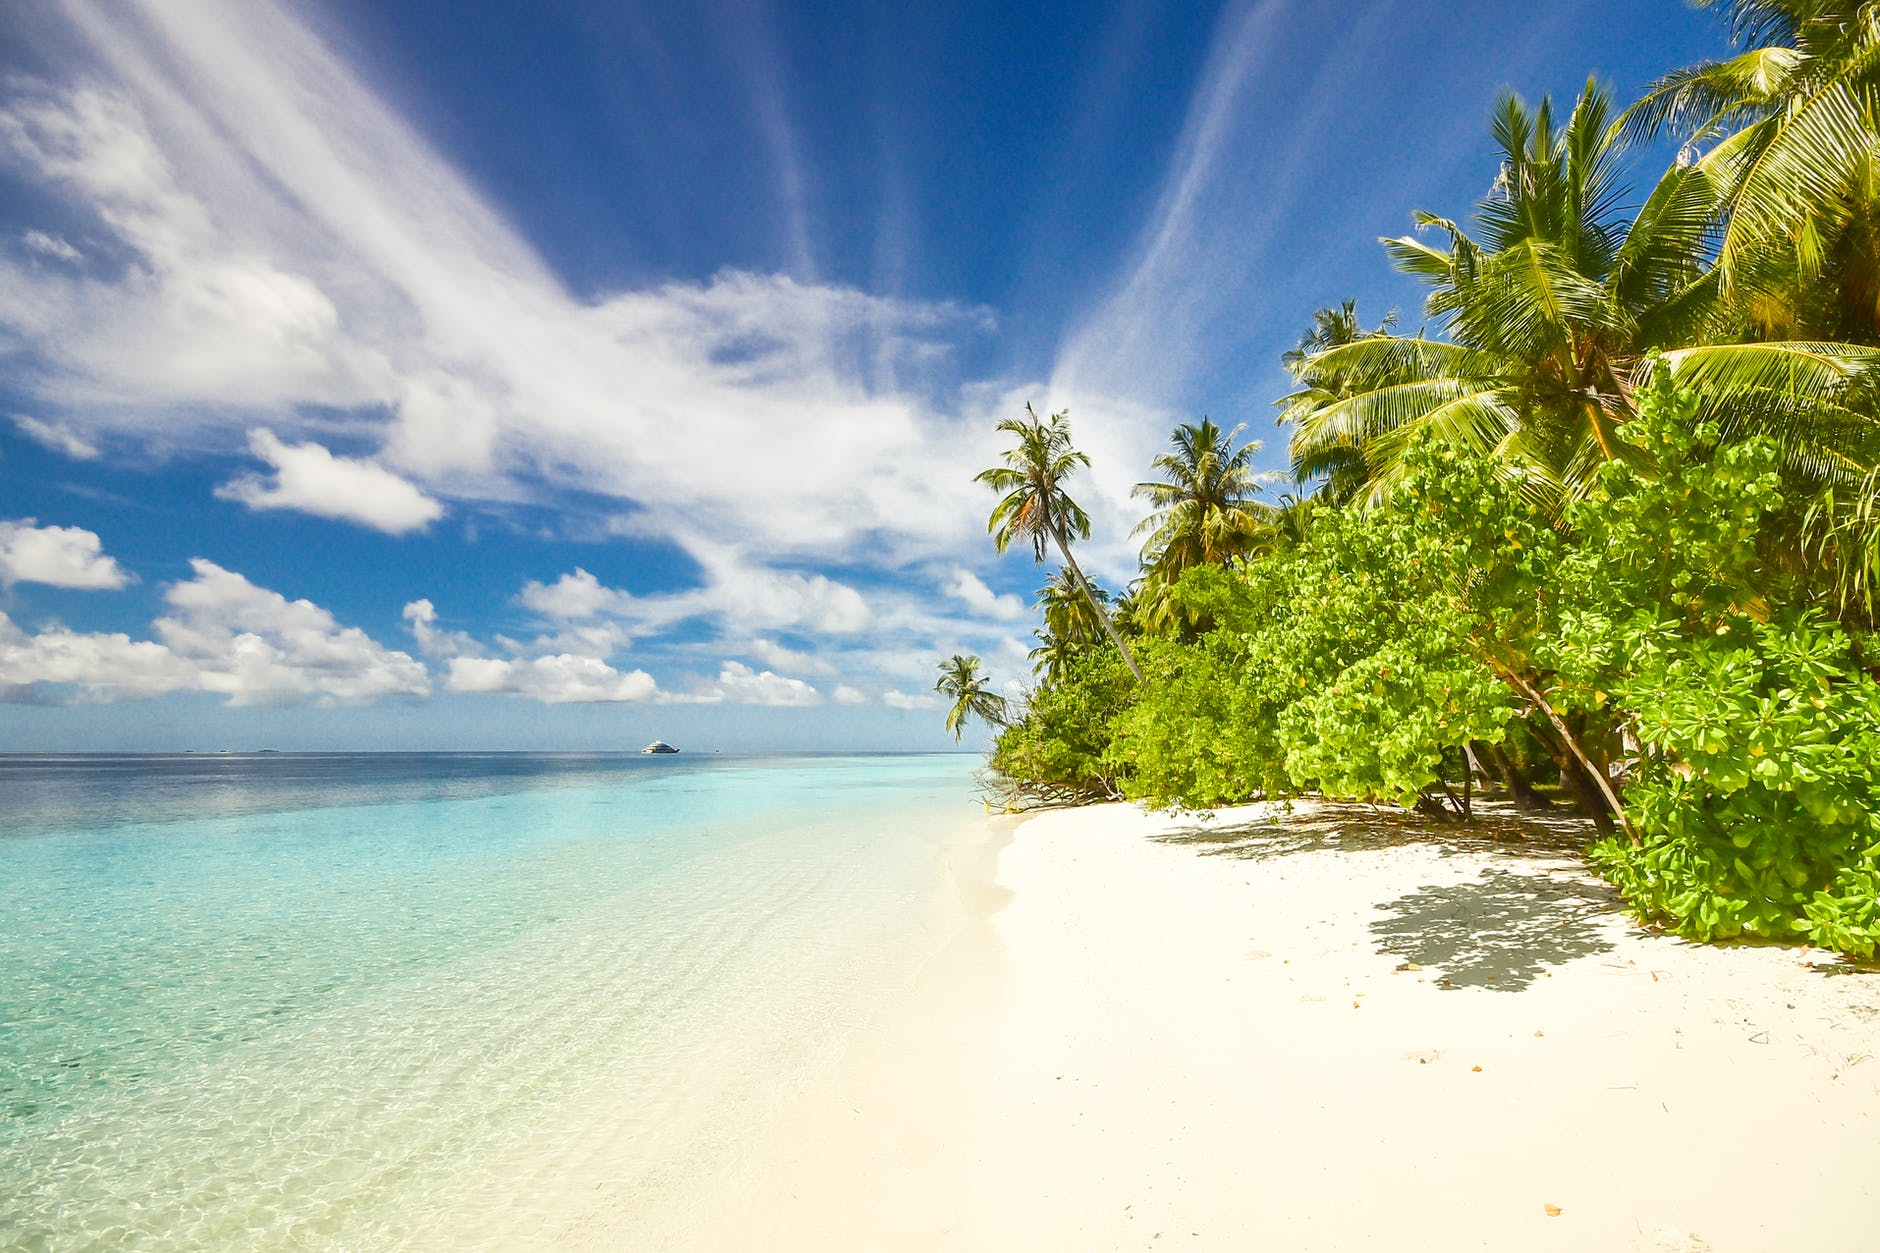 Beach - Photo by Asad Photo Maldives